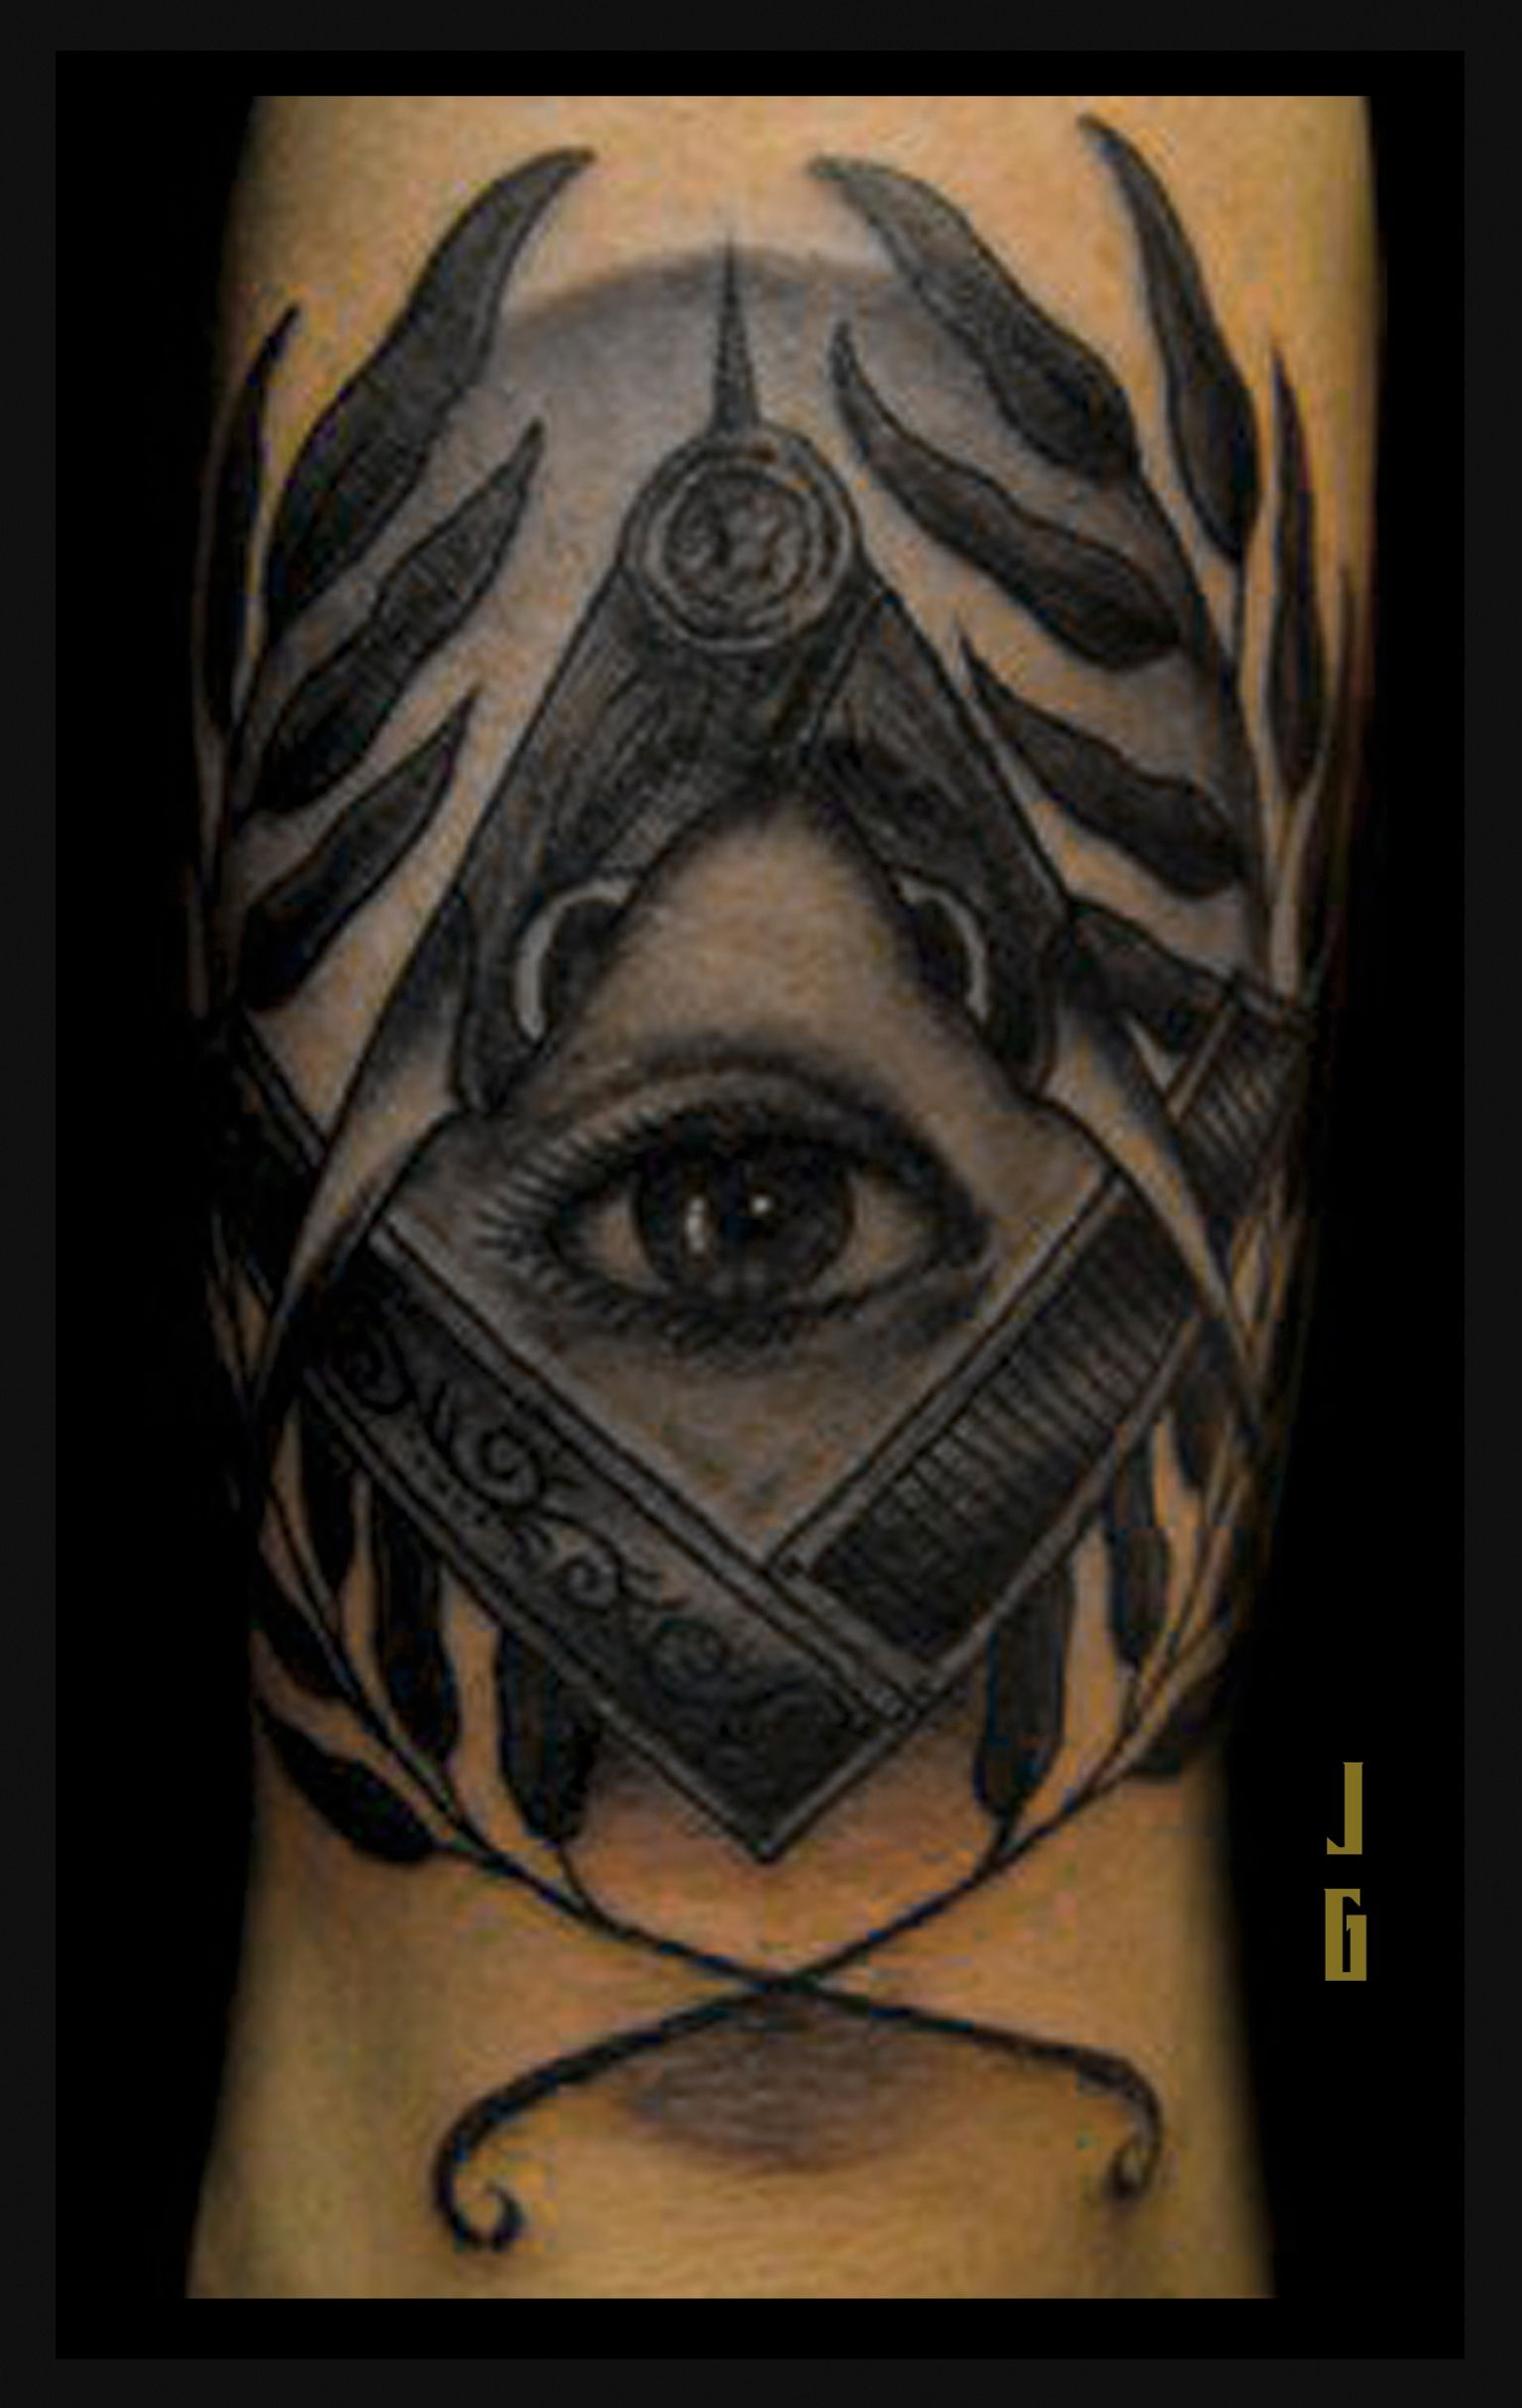 Square, Compass, All seeing eye Tattoo Masonic tattoos